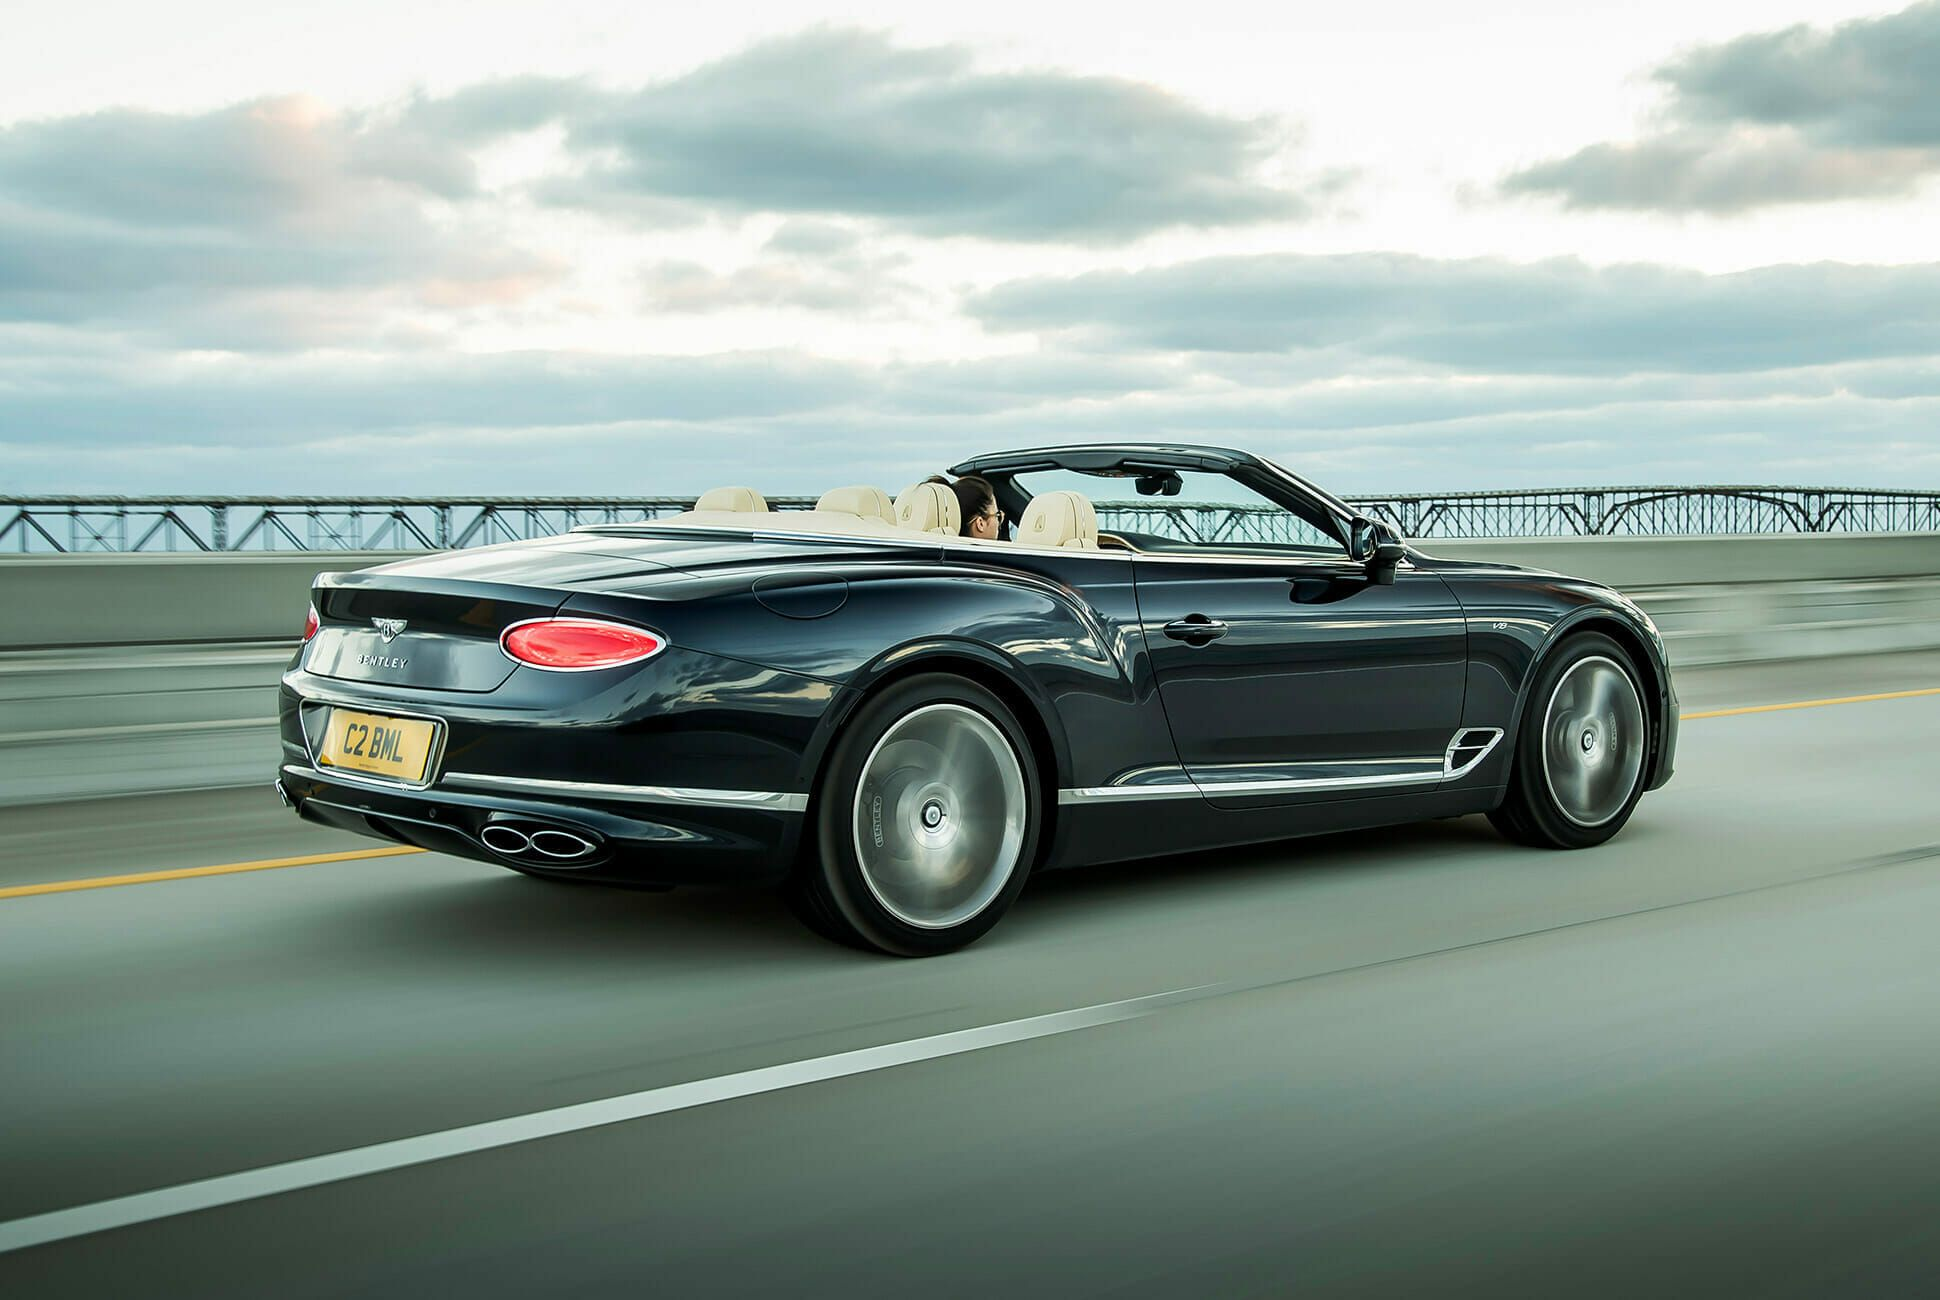 Bentley-Continental-GT-Convertible-V8-gear-patrol-slide-01